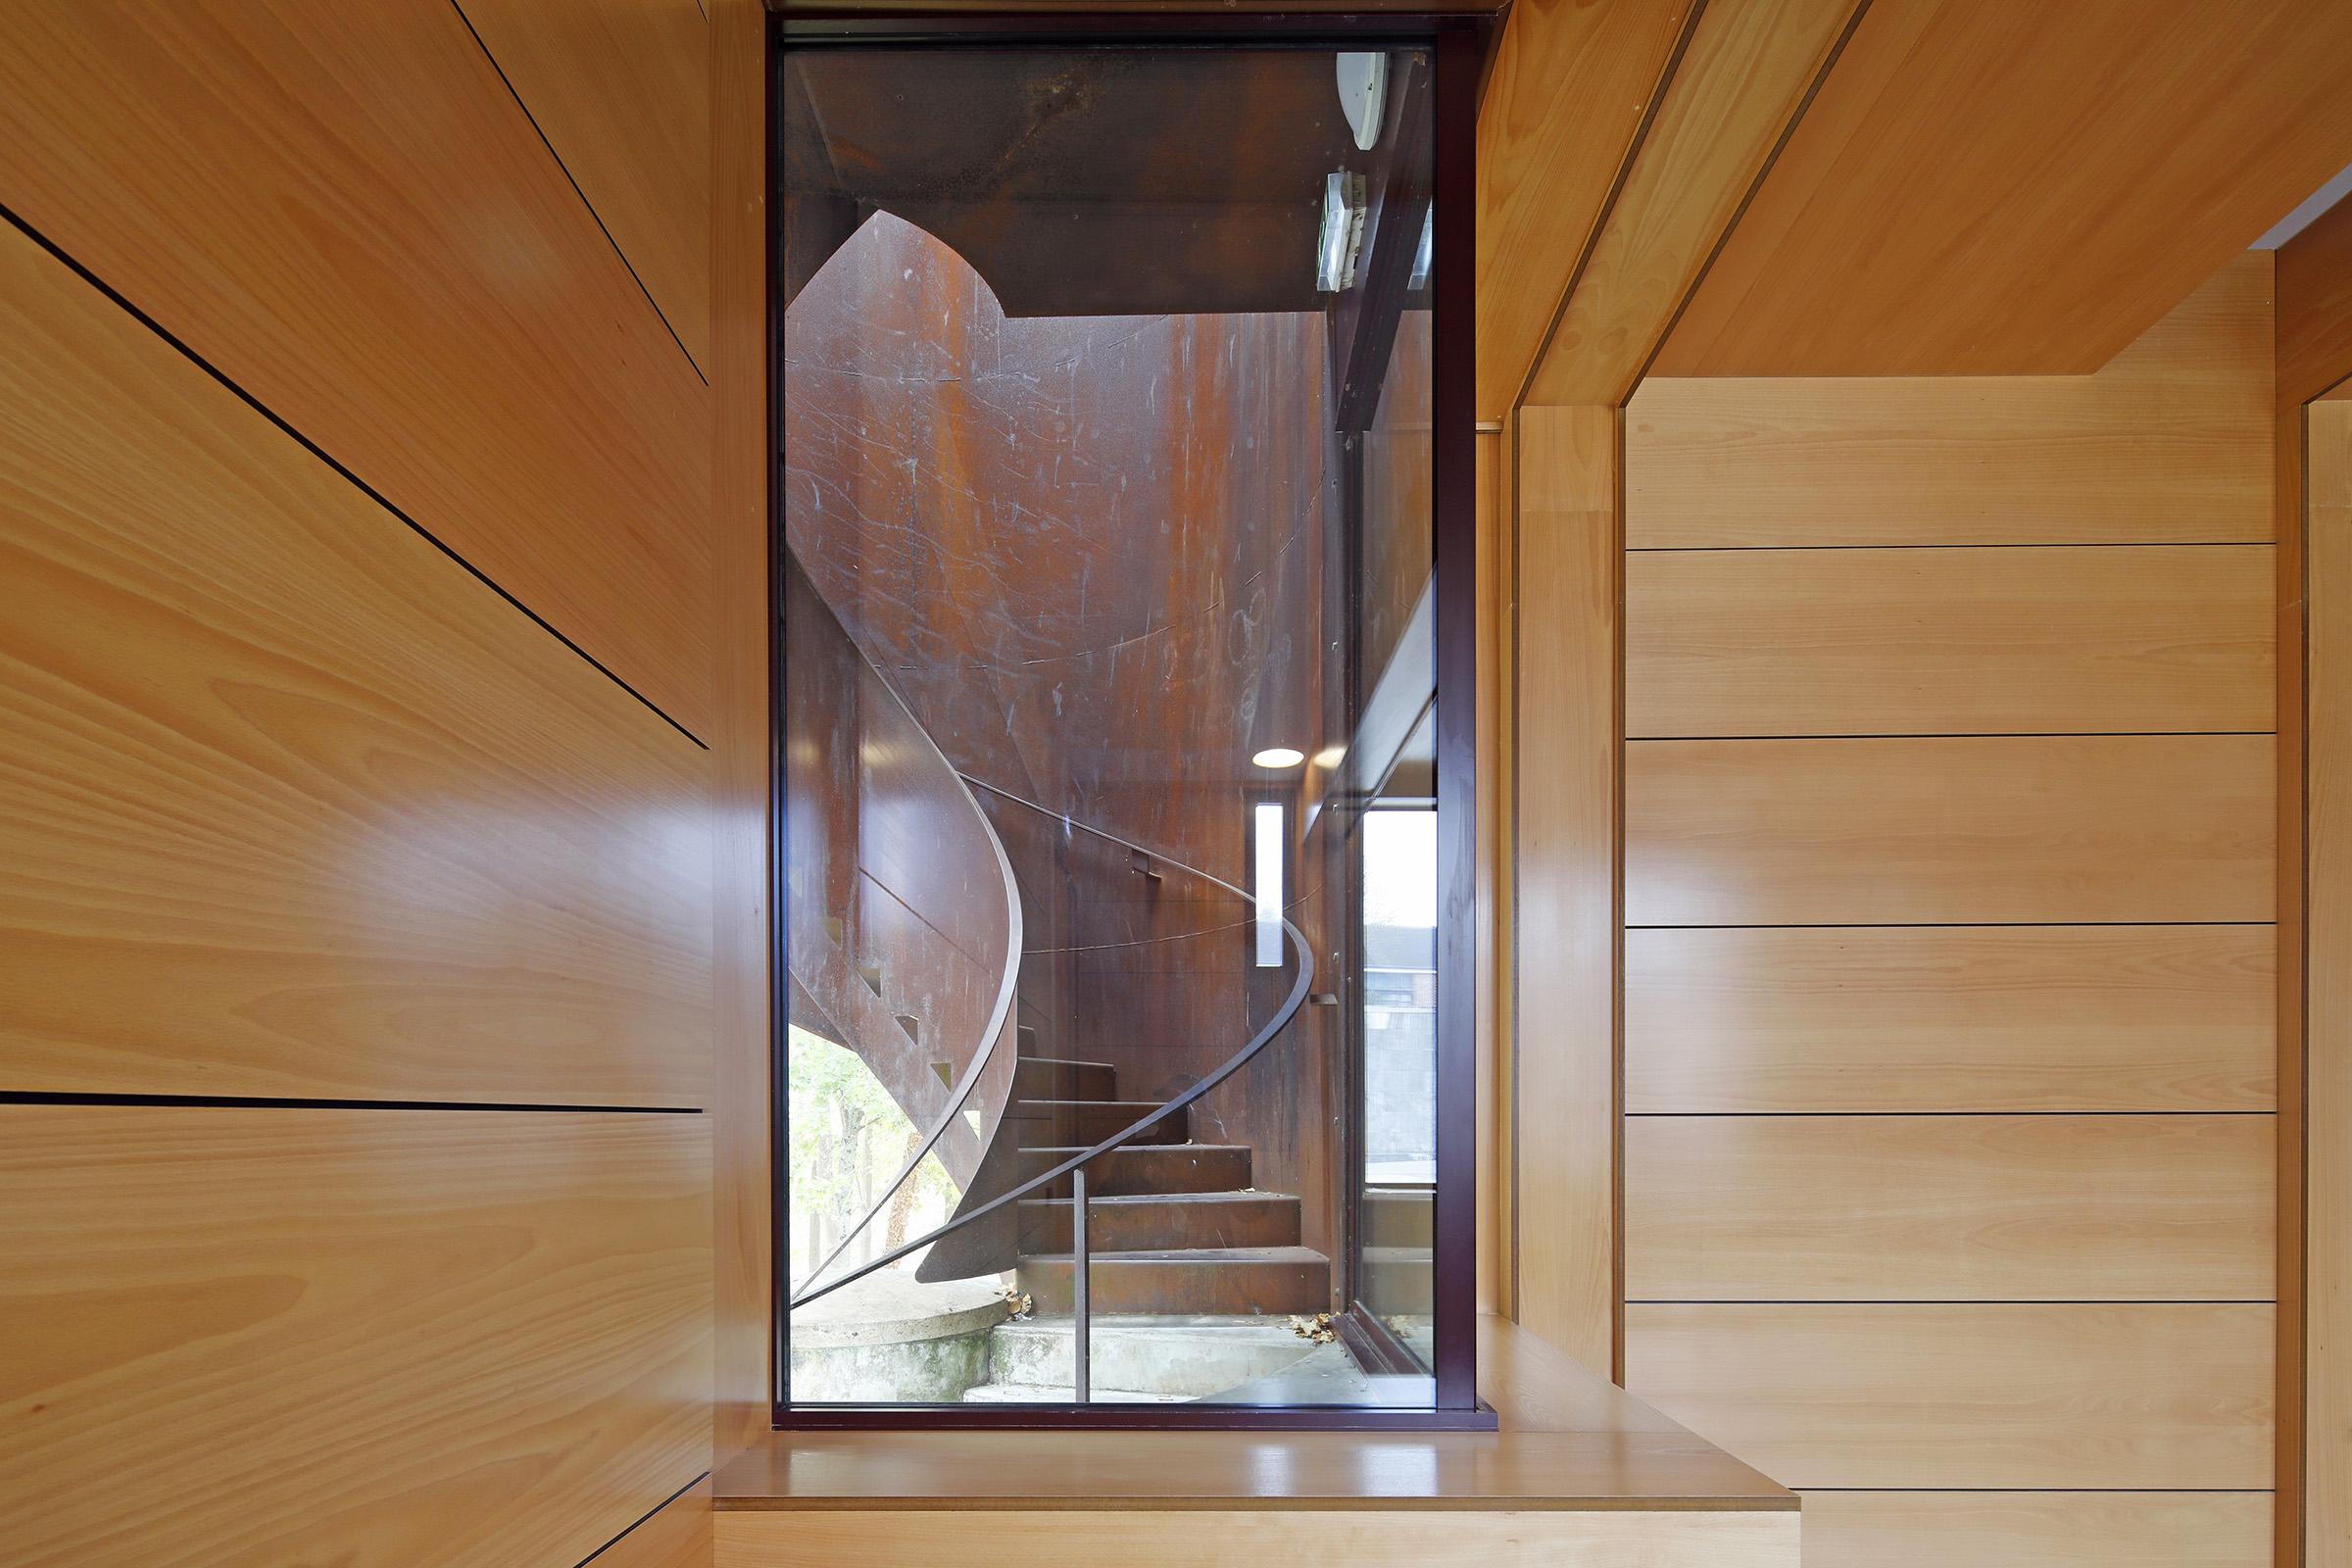 Amilly - La Maison Saint Loup - Interieur - Sylvain Dubuisson 050.jpg